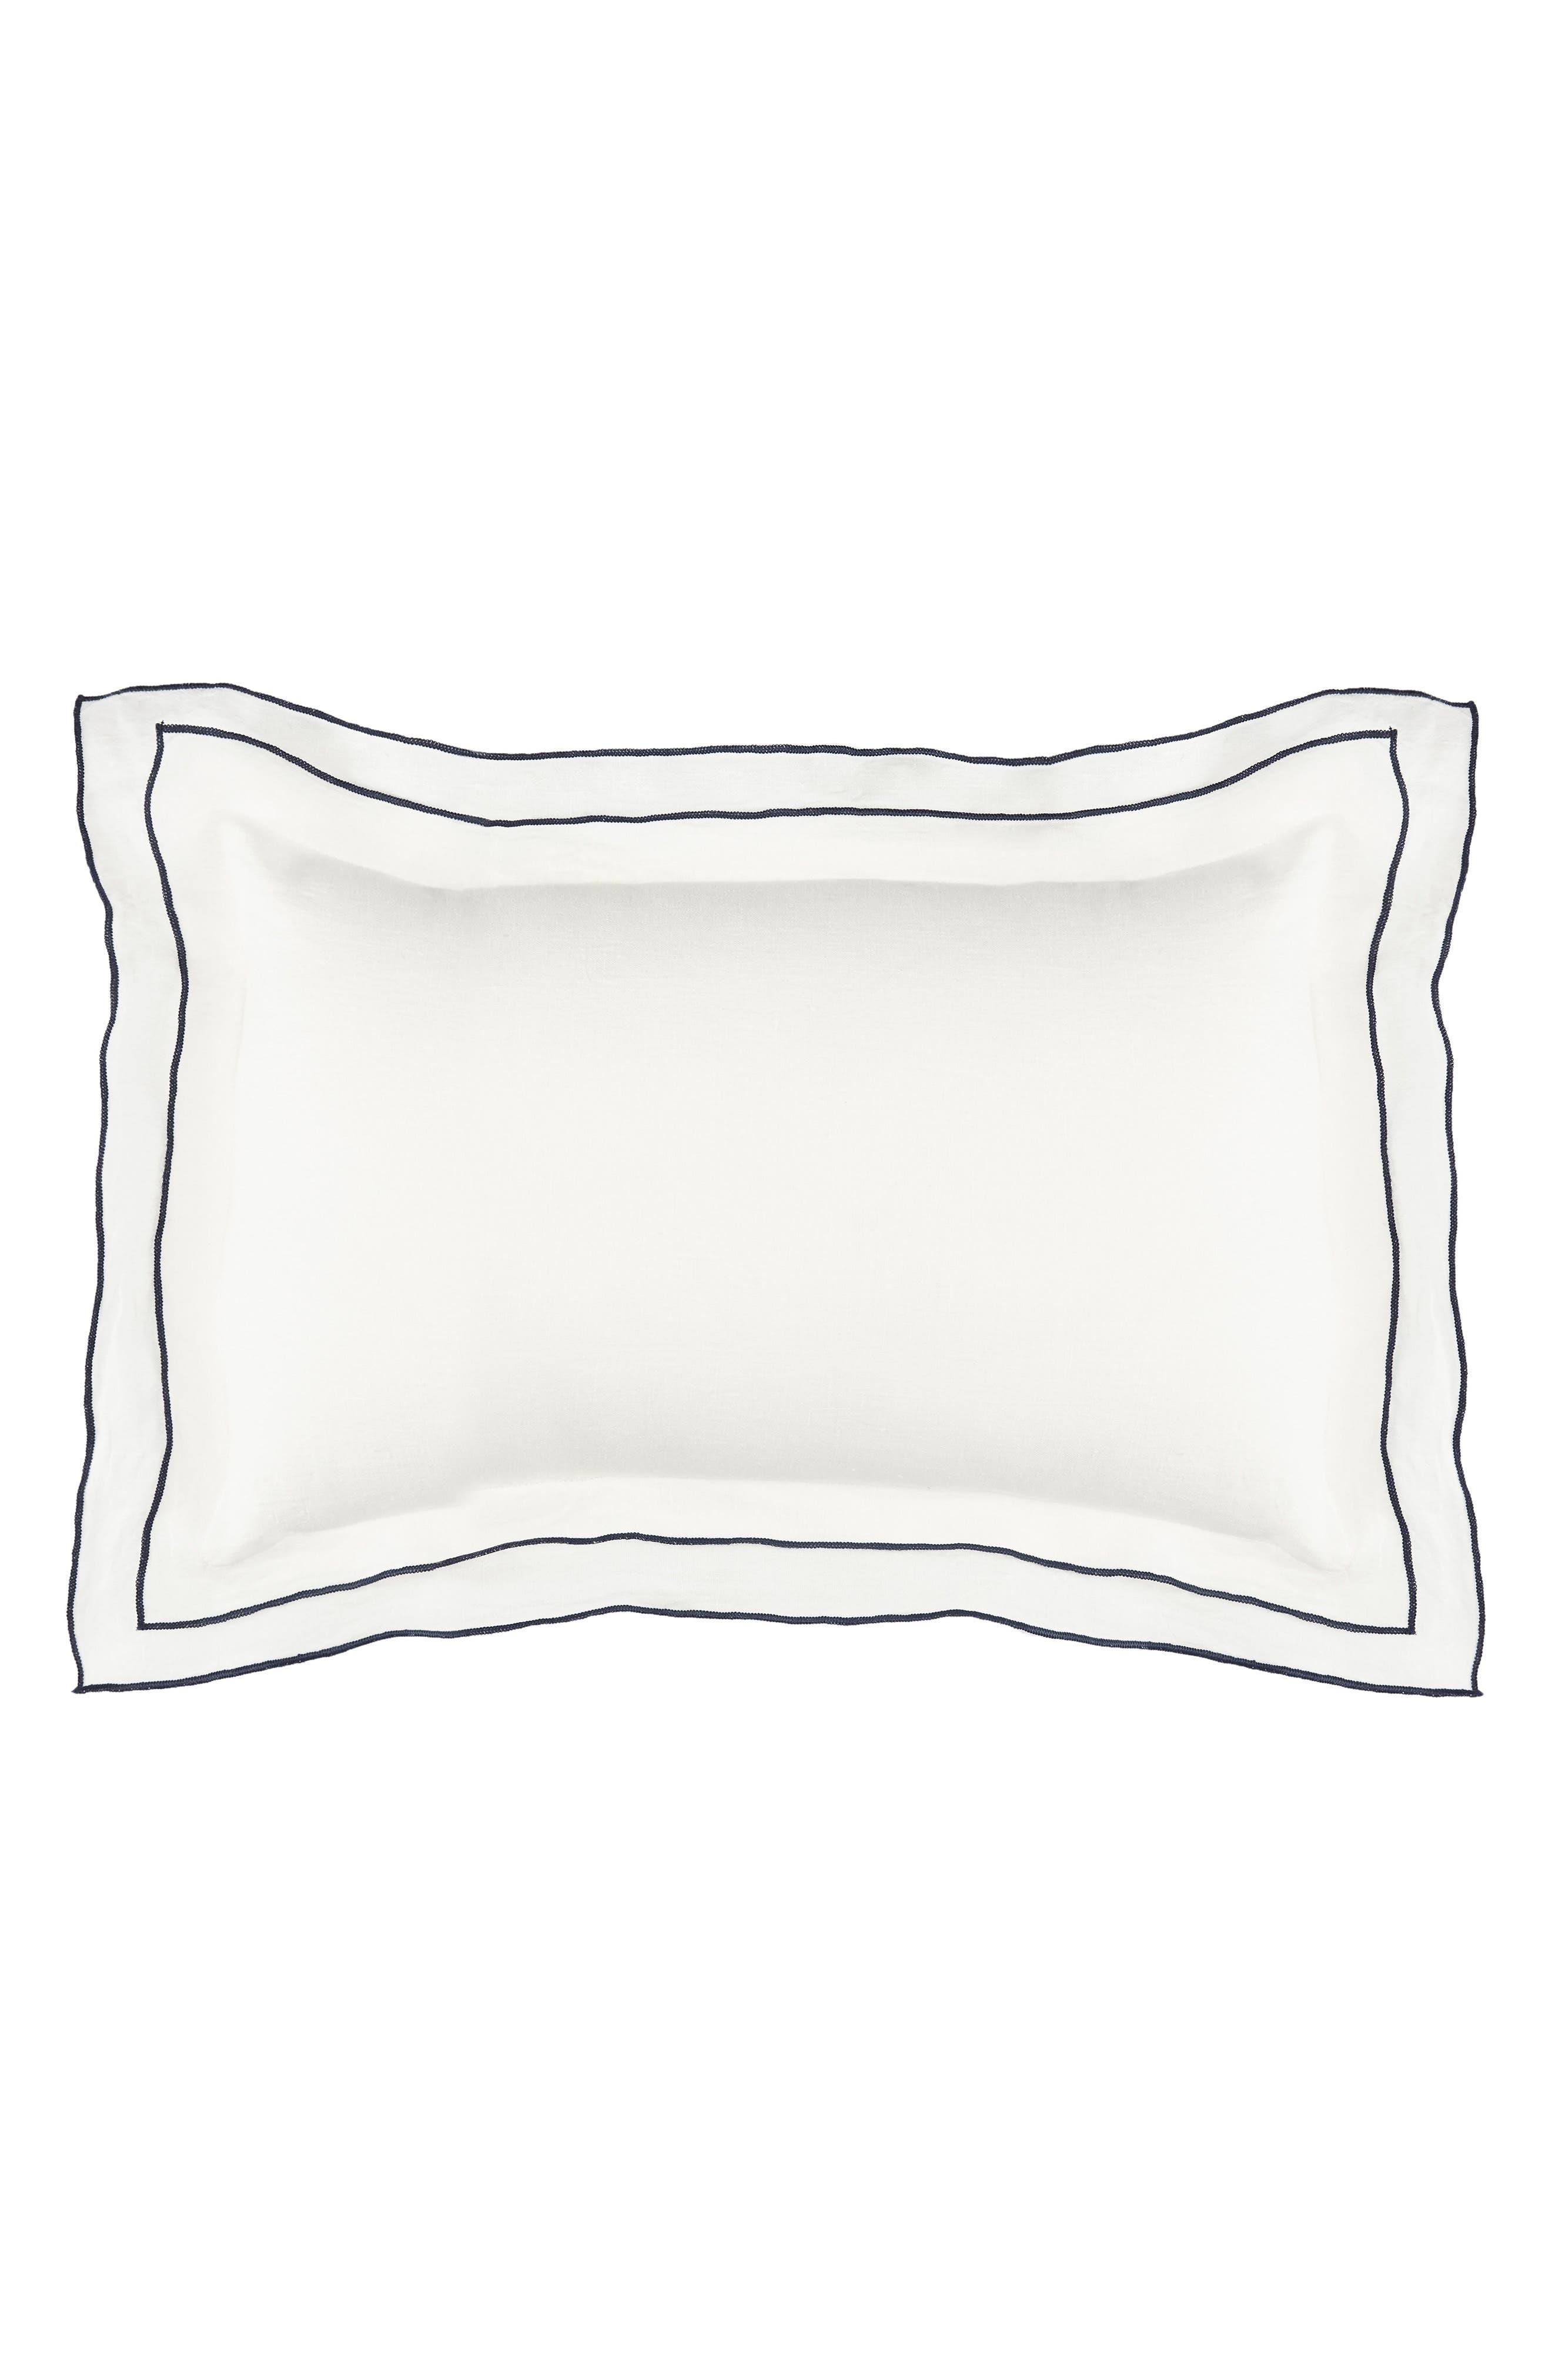 Alternate Image 1 Selected - KASSATEX Biarritz Linen Accent Pillow